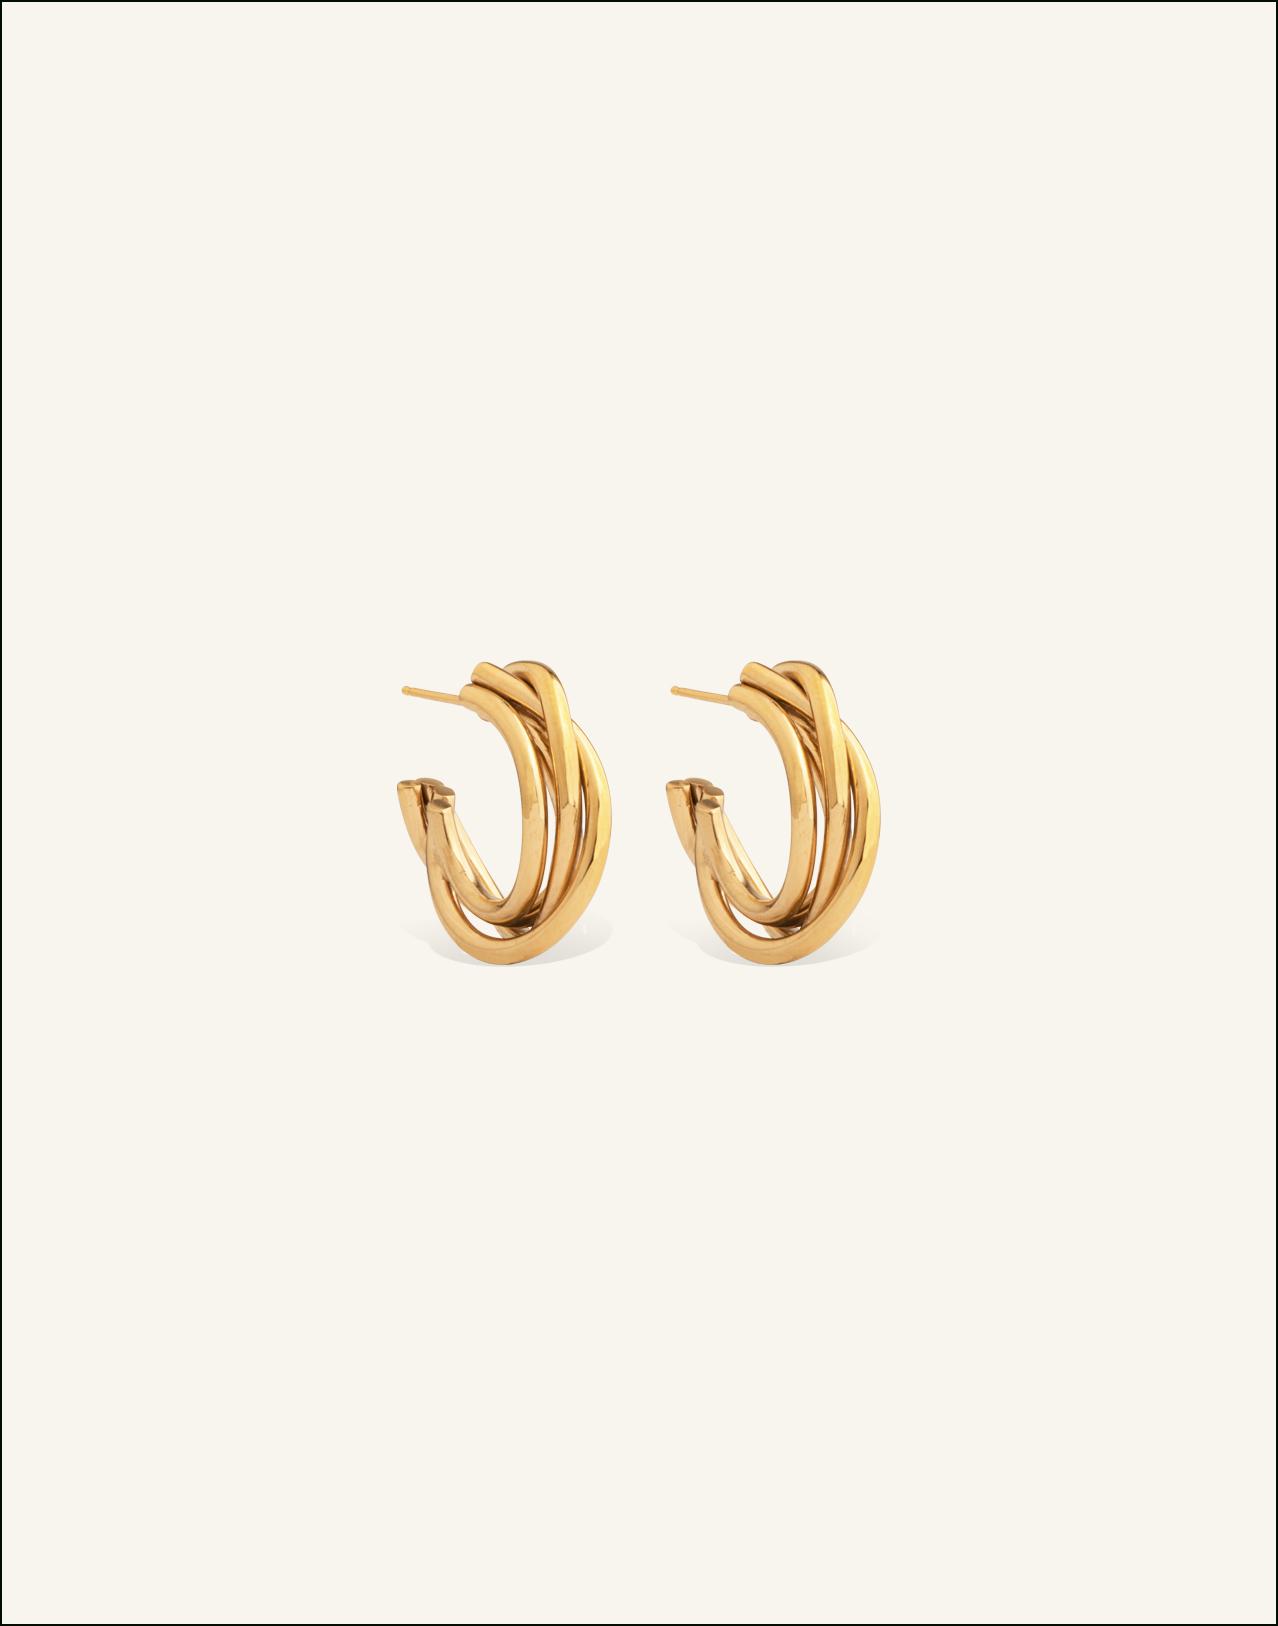 Completedworks-Earrings-An-Encounter-2-1.jpg